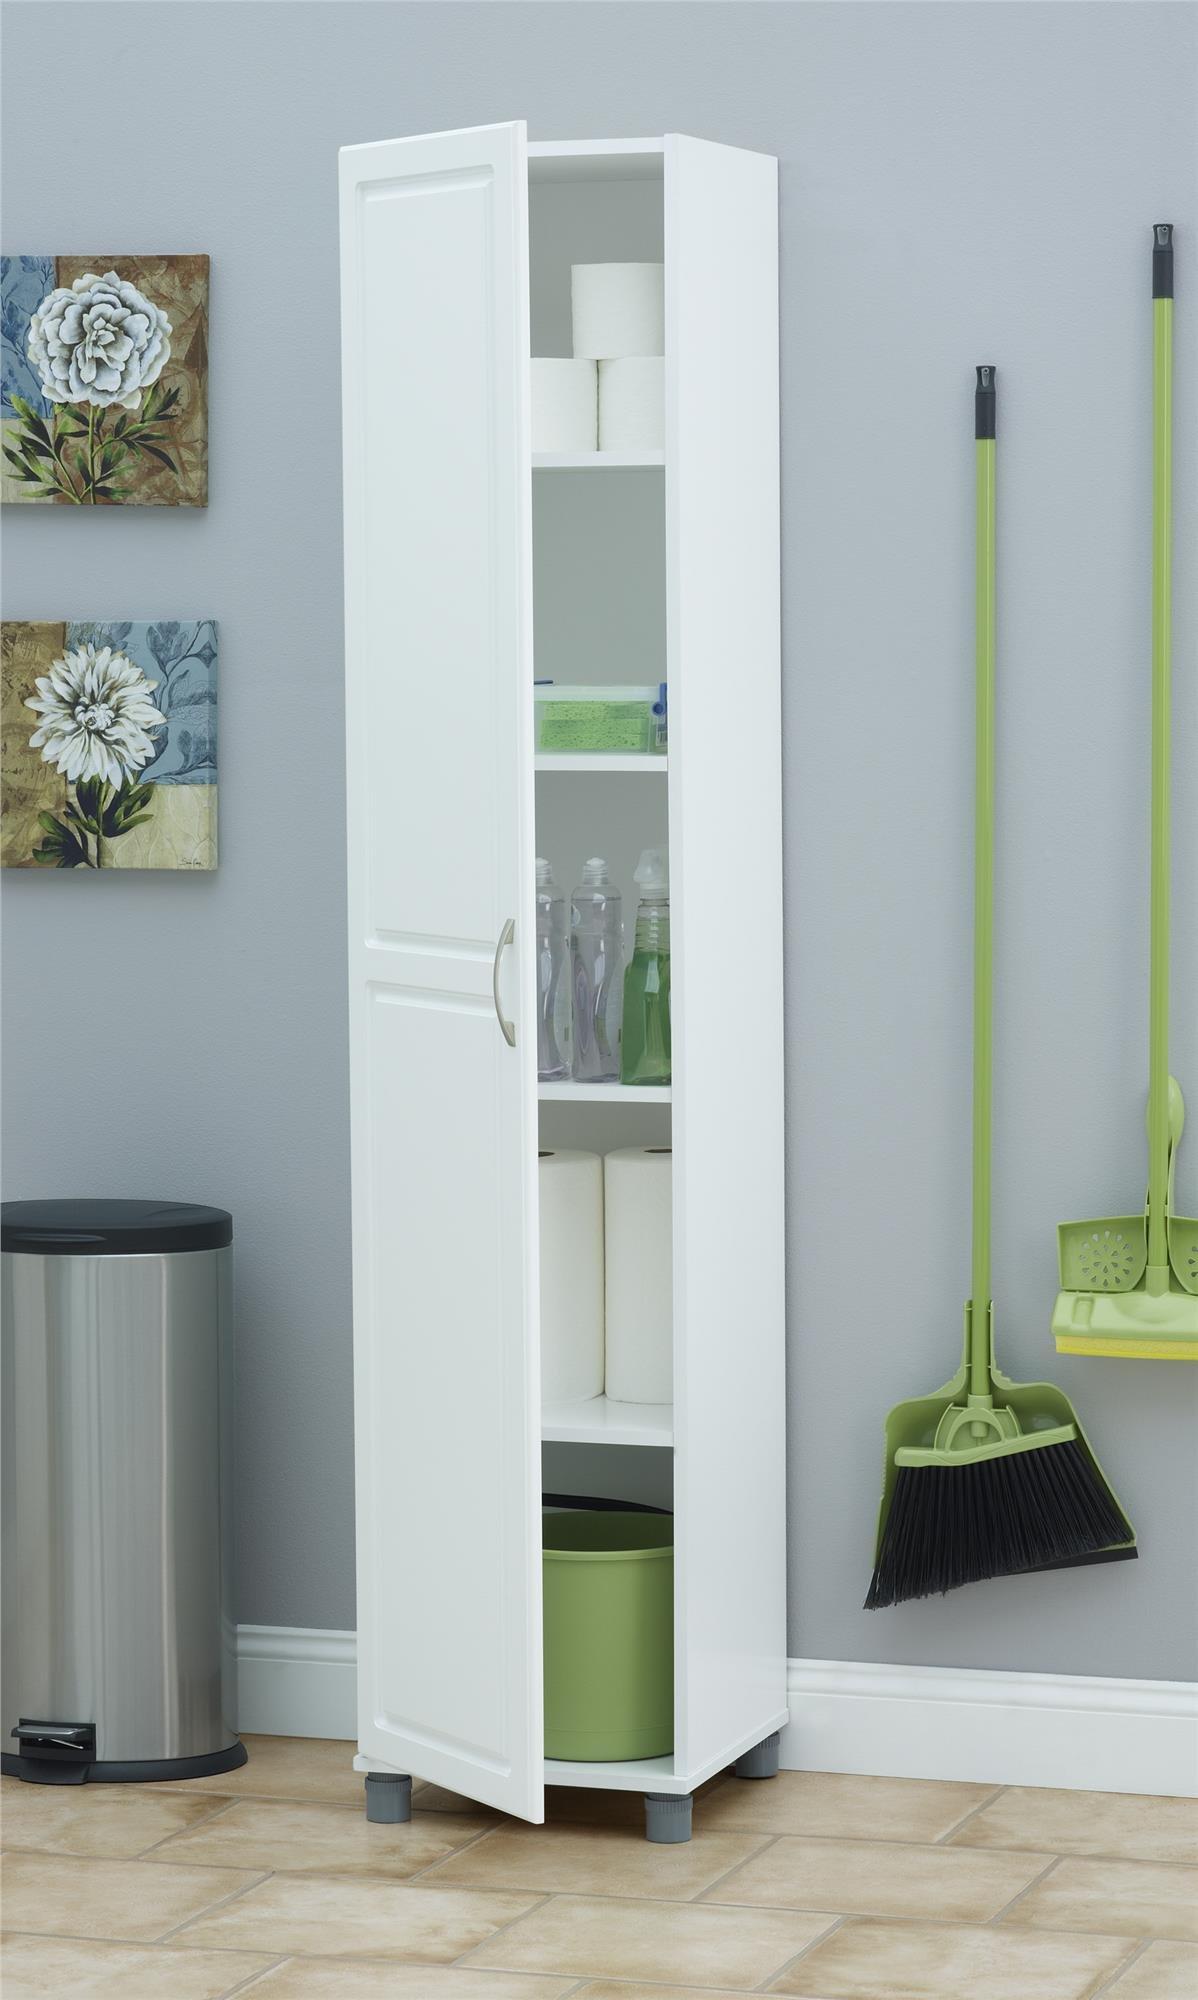 Ameriwood SystemBuild Kendall 16'' Storage Cabinet, White Stipple